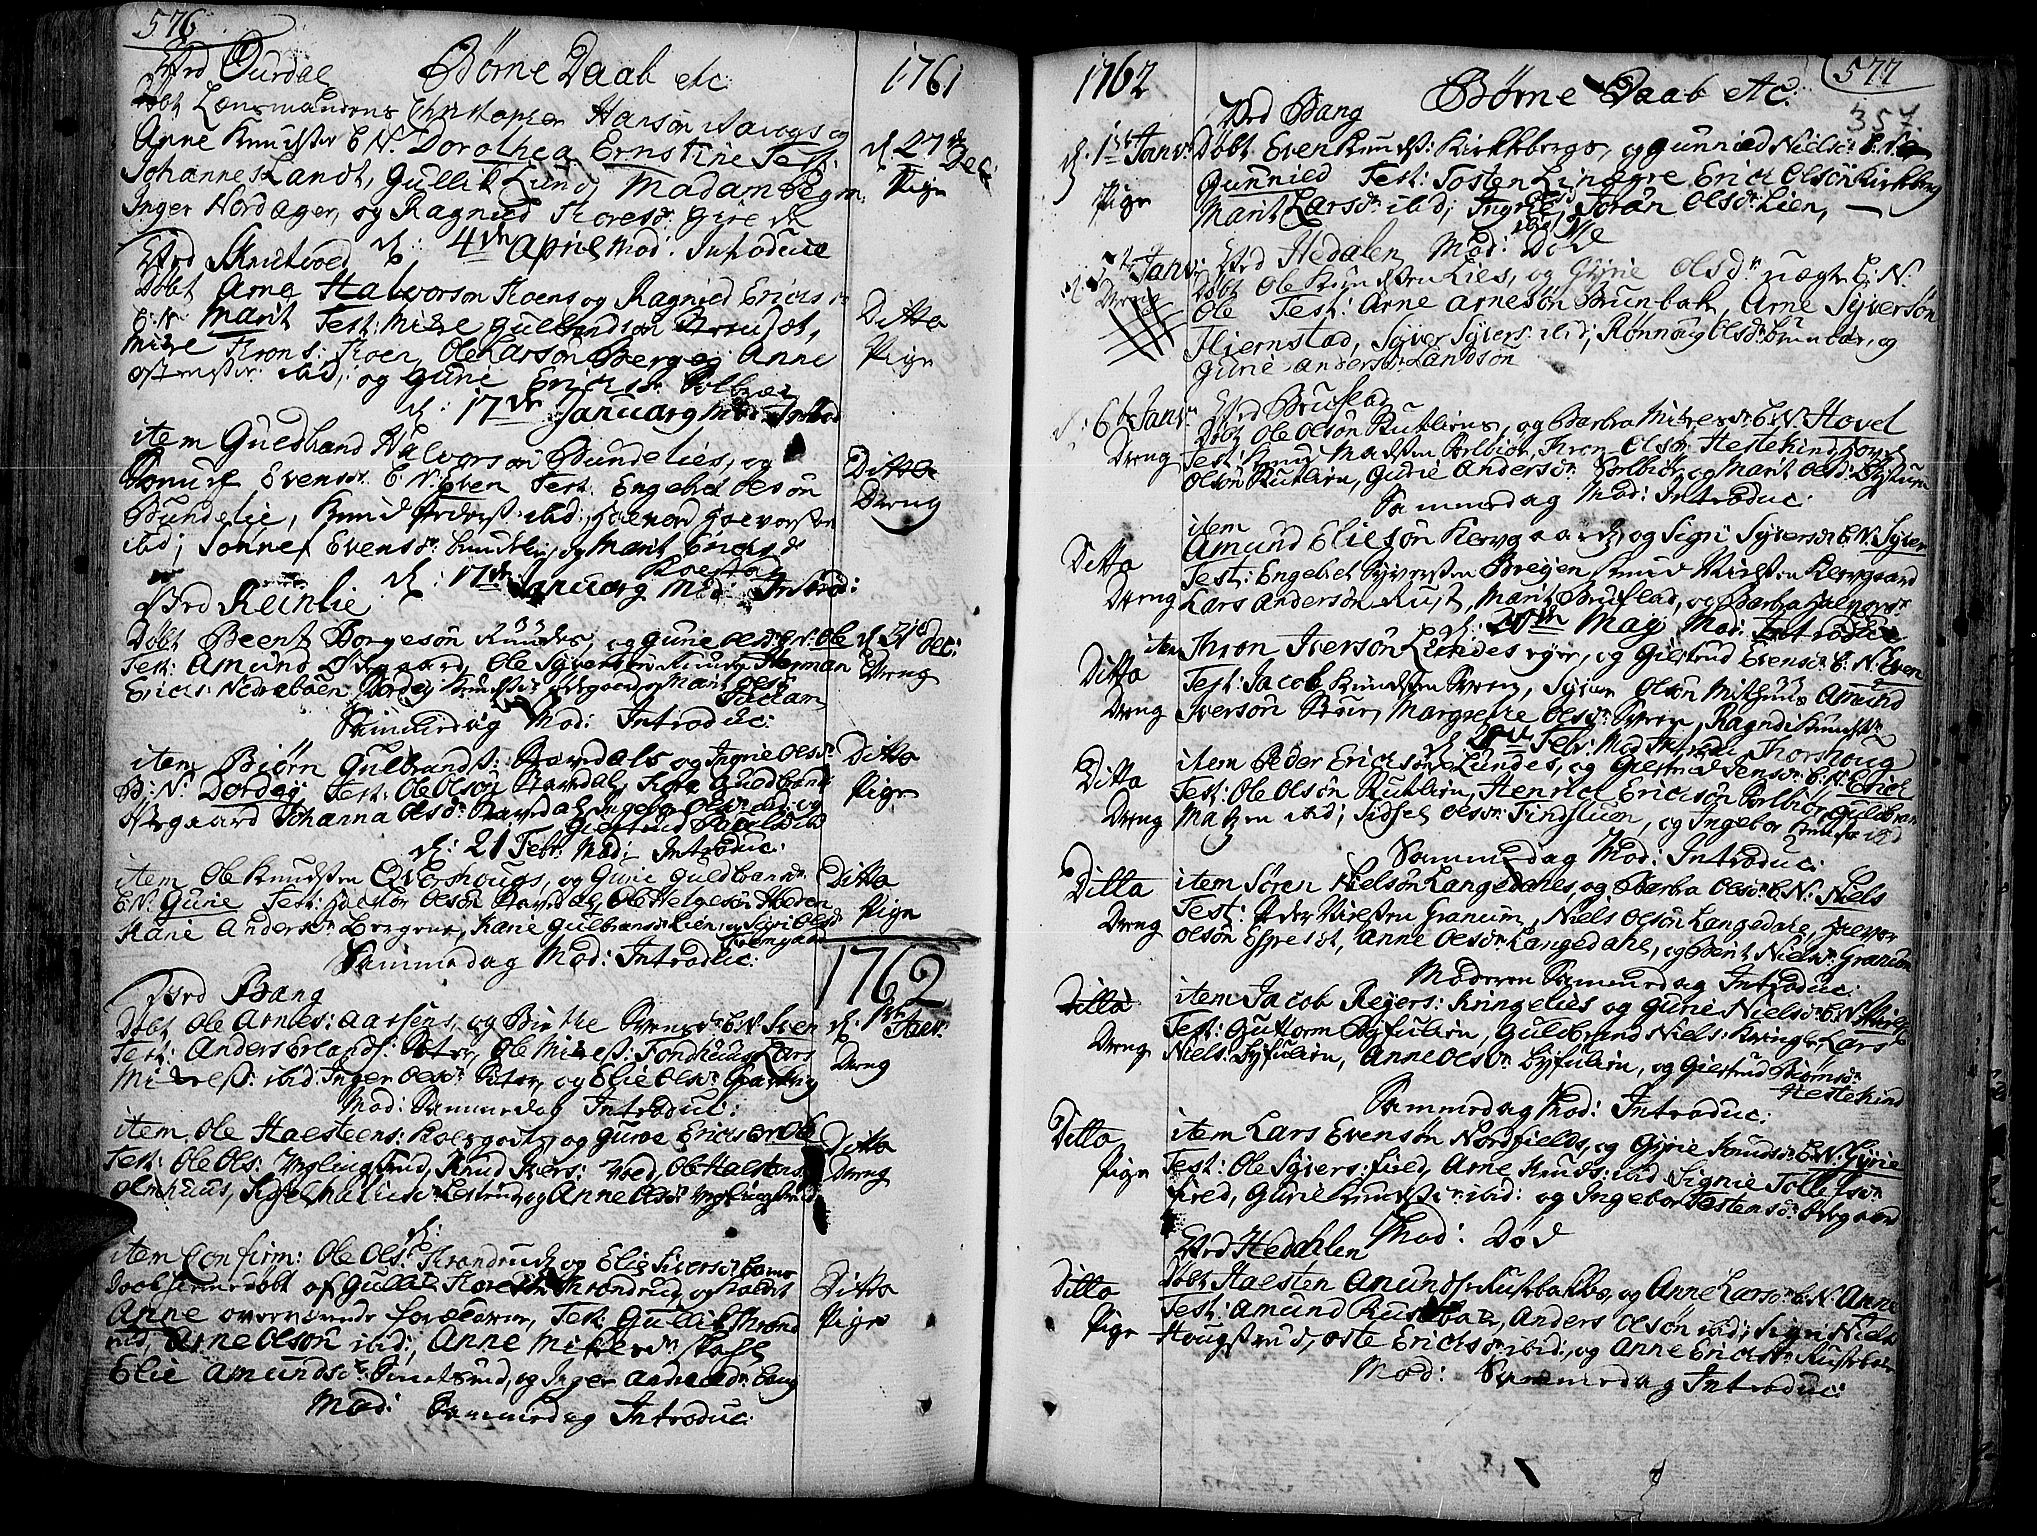 SAH, Aurdal prestekontor, Ministerialbok nr. 4, 1730-1762, s. 576-577